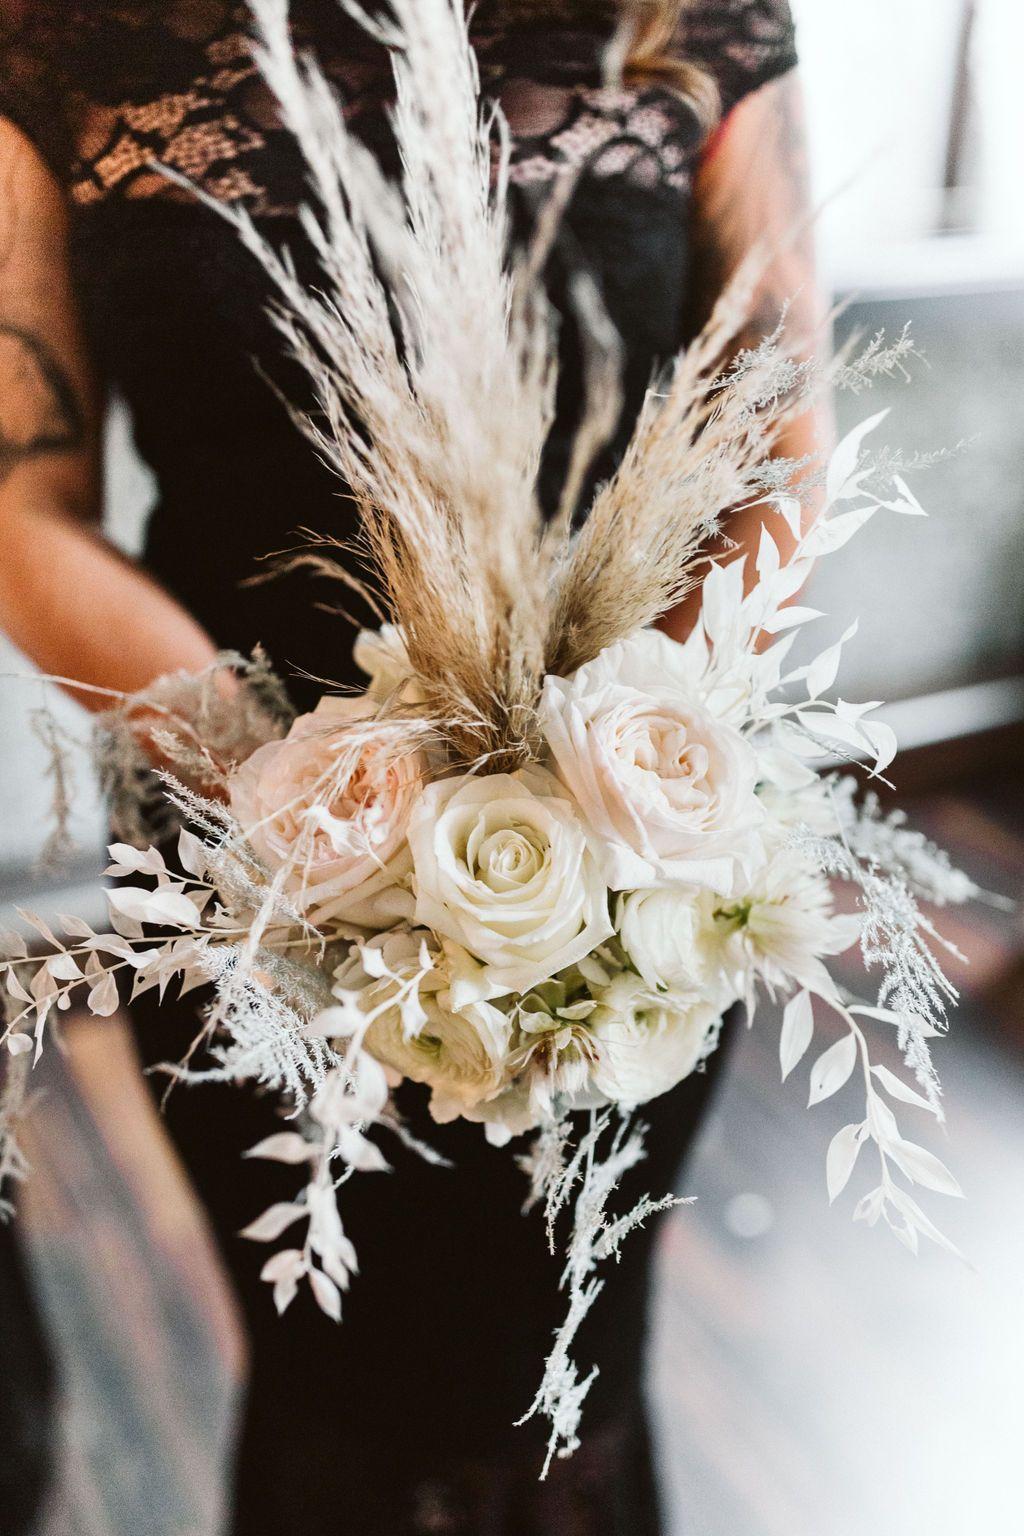 Bridal Bouquet Unique wedding venues, Wedding venues